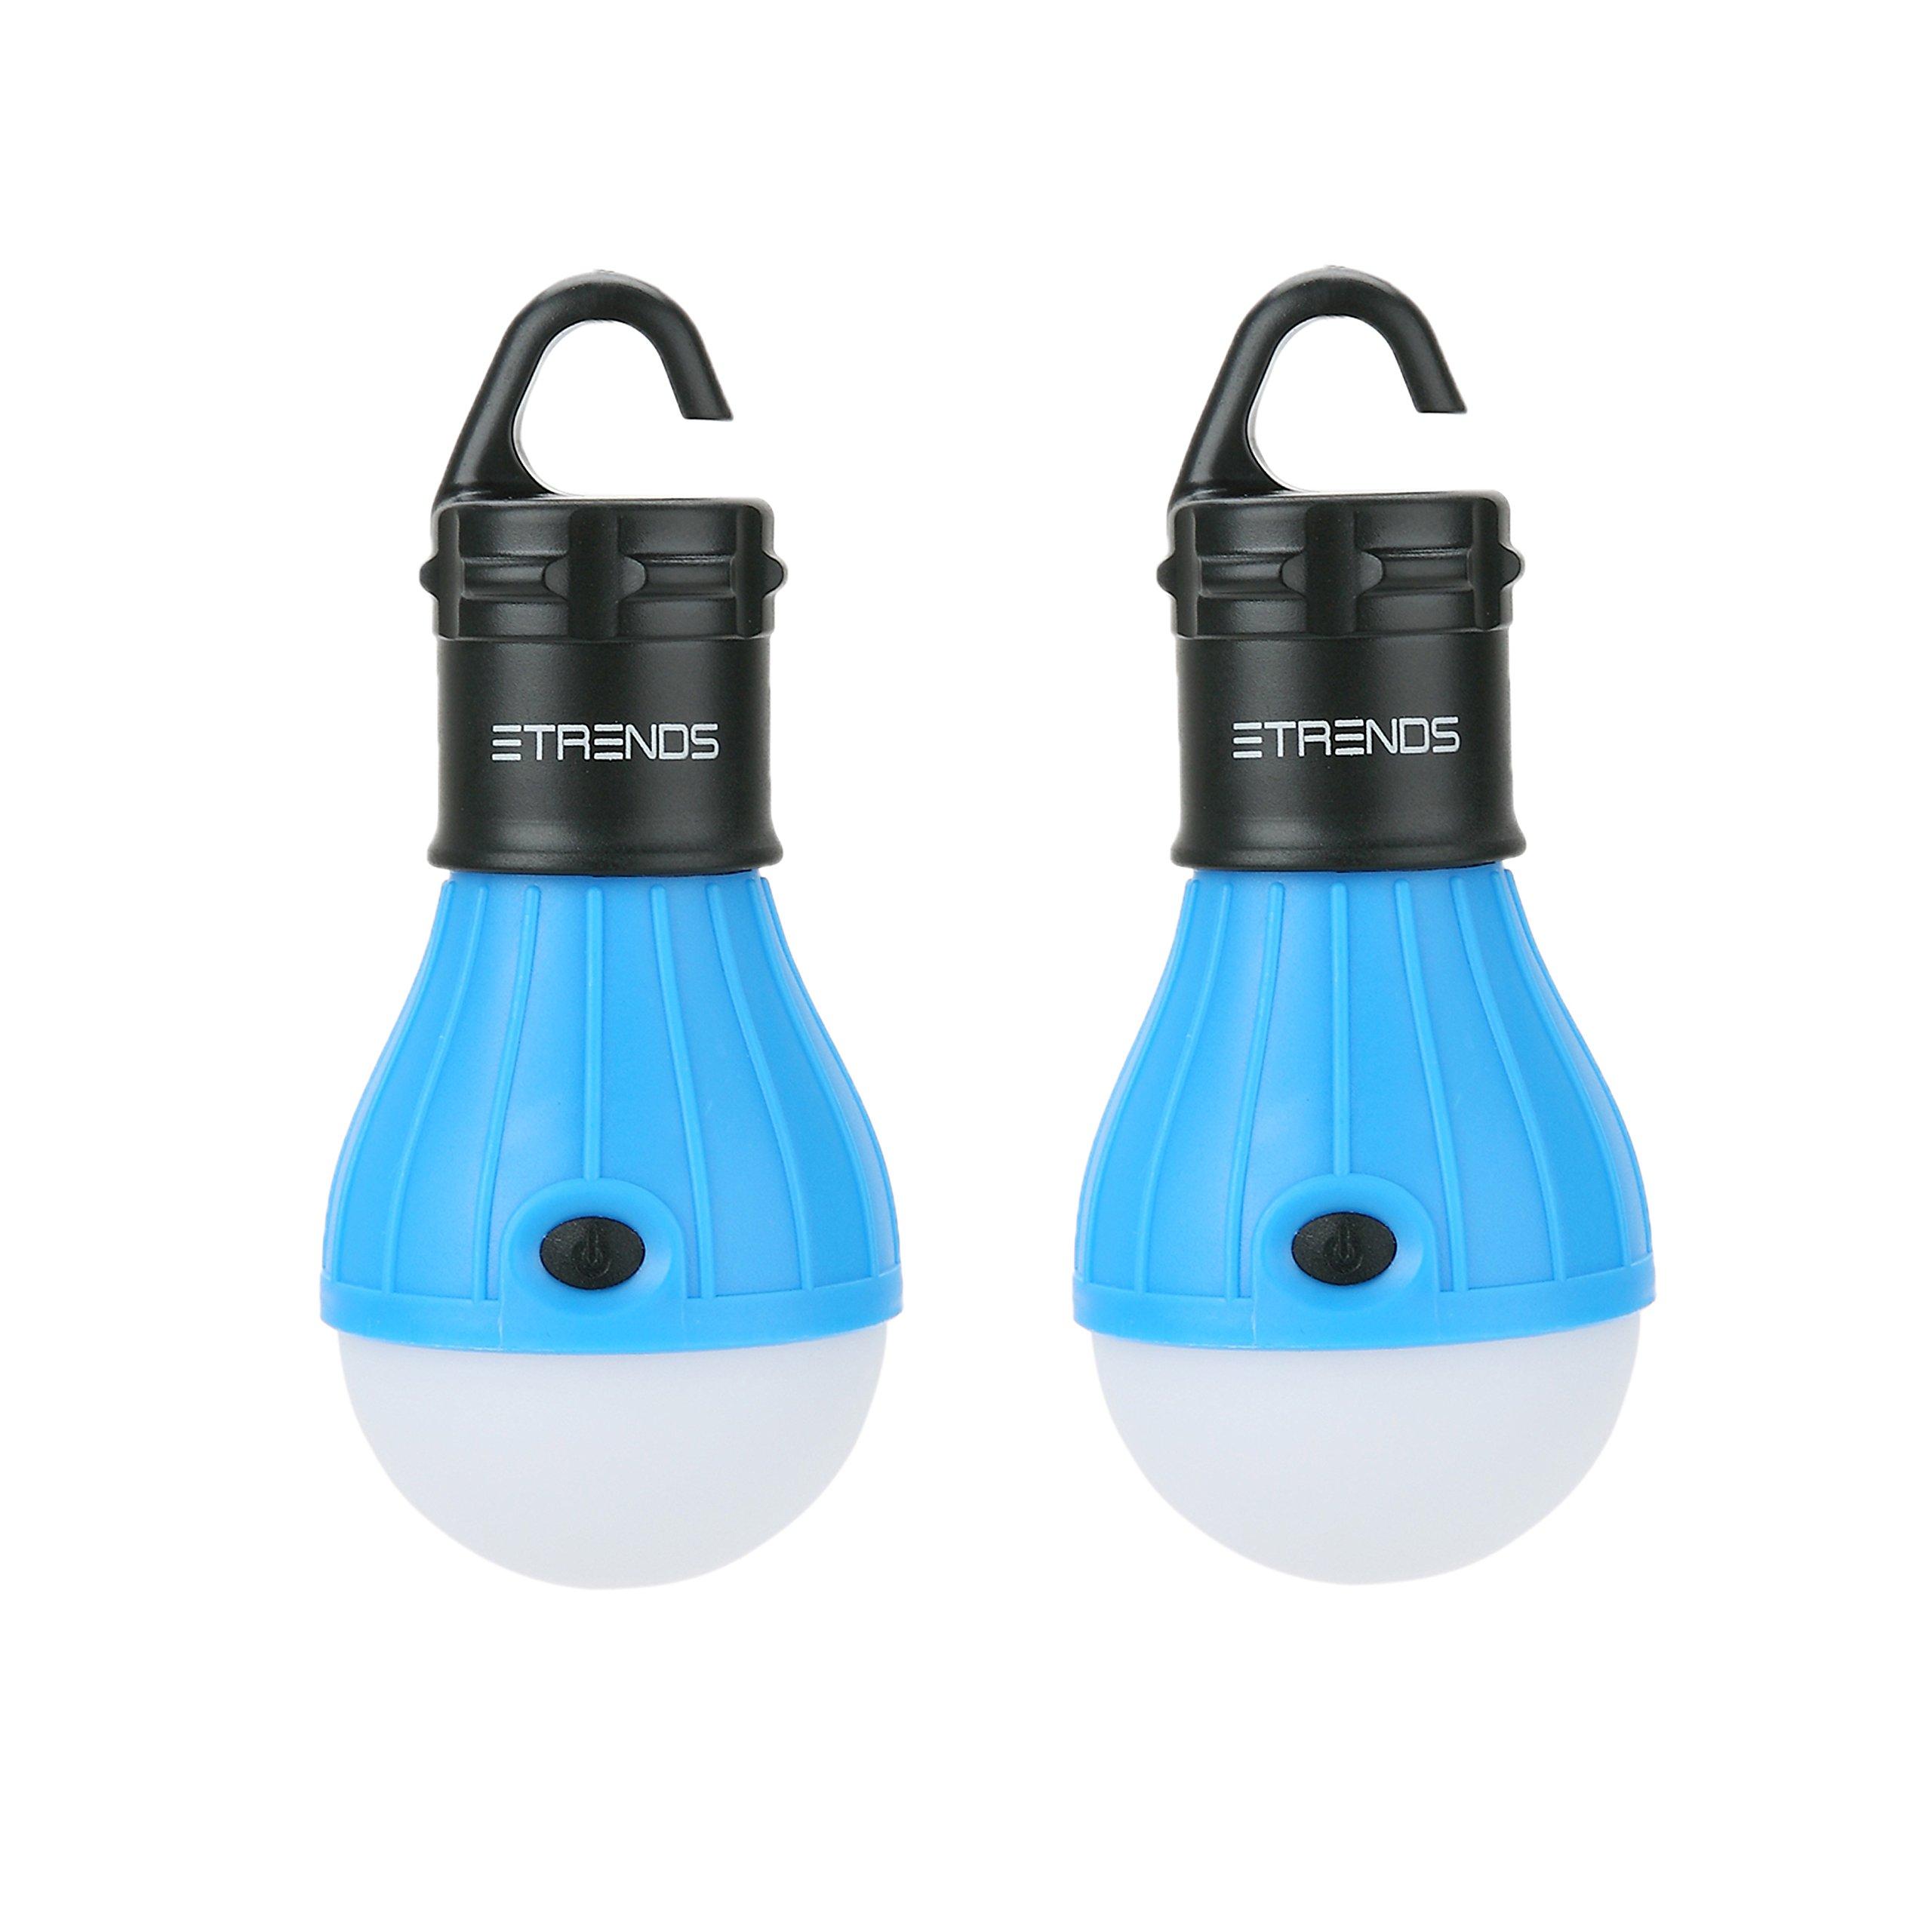 2 Pack E-Trends Portable Led Lantern Light Bulb For Camping Hiking Night Fish.. 14